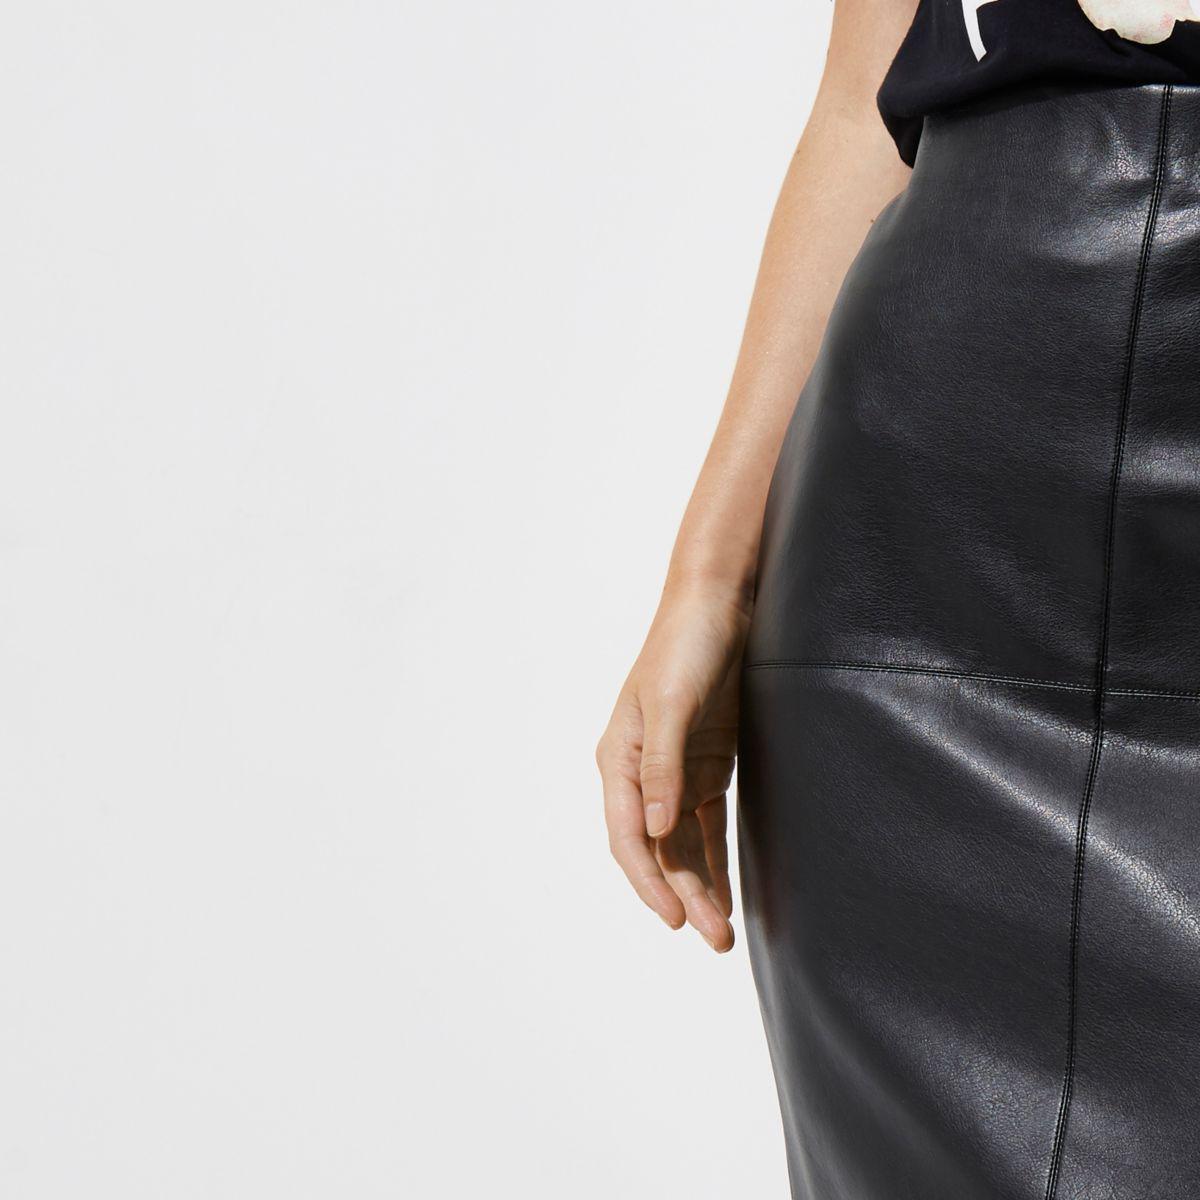 169ea5bb08 River Island Petite Black Faux Leather Bodycon Midi Skirt in Black ...